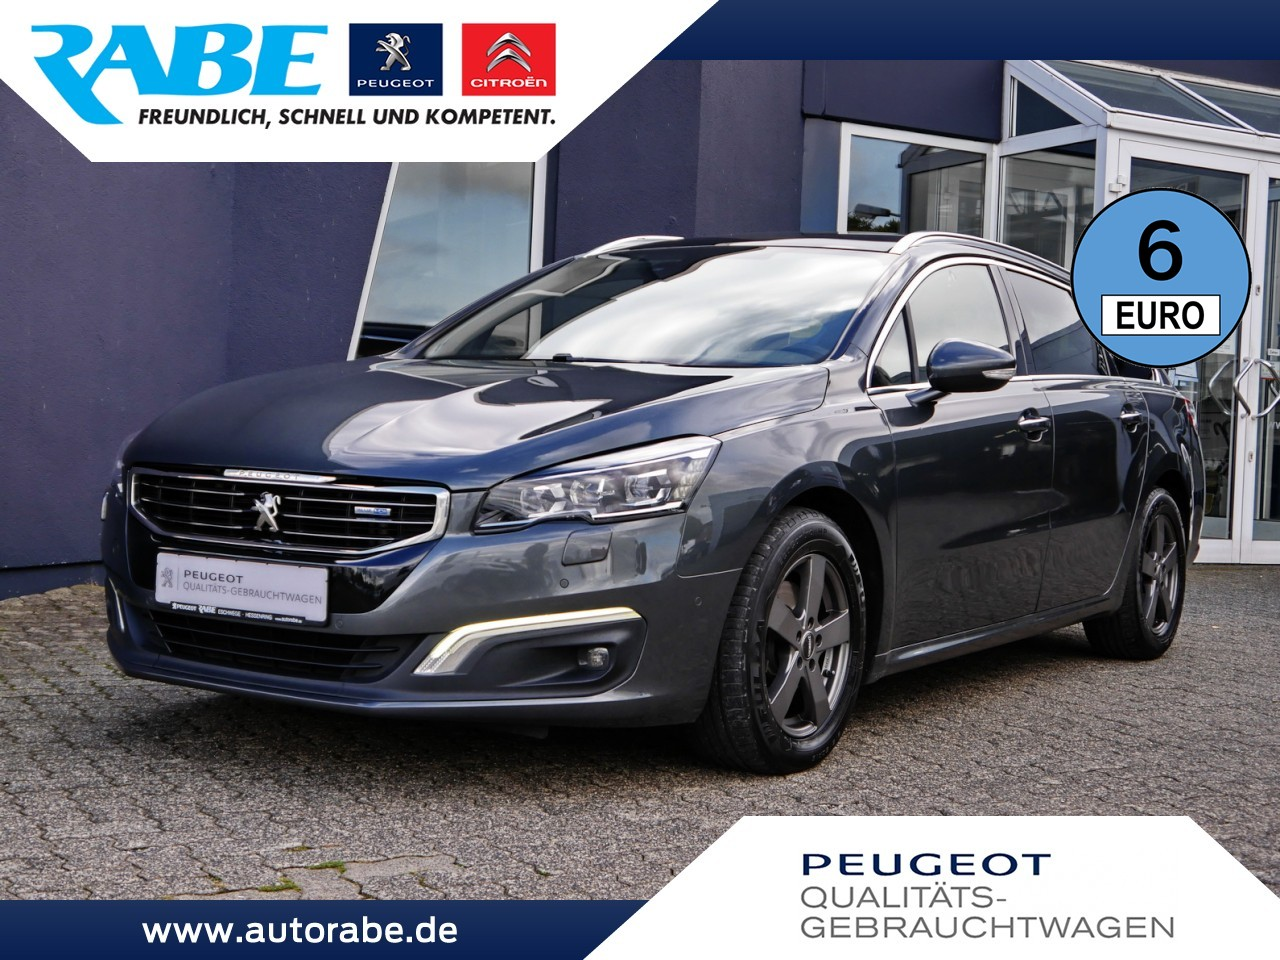 Peugeot 508 SW Allure 150 BlueHDi Navi+Pano+LED+Totwink., Jahr 2015, Diesel